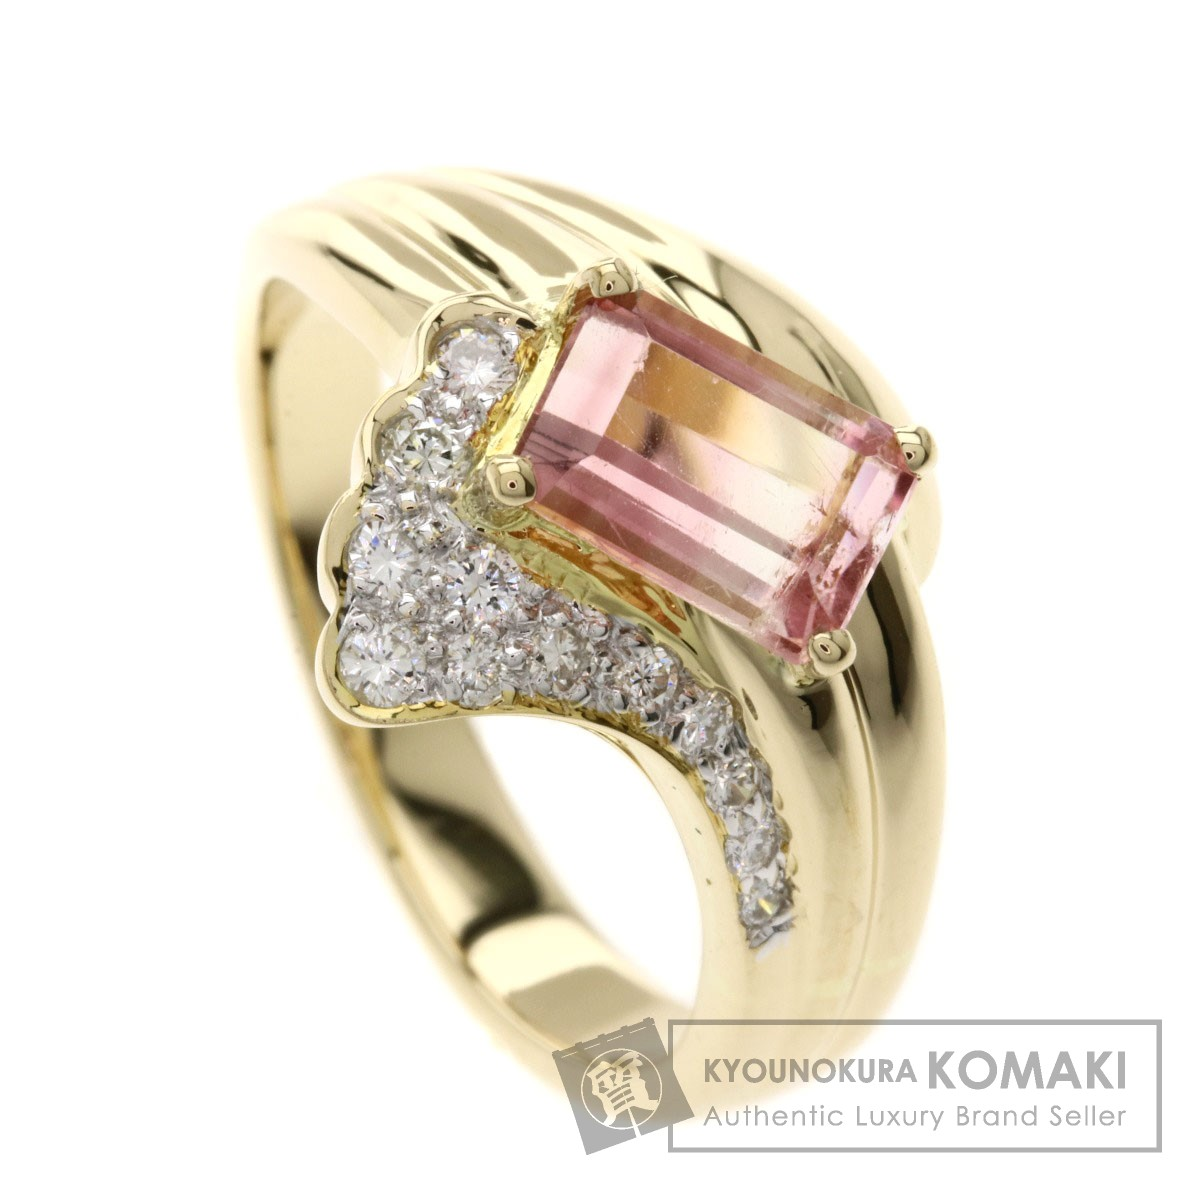 1.24ct ピンクトルマリン/ダイヤモンド リング・指輪 K18イエローゴールド 6.7g レディース 【中古】